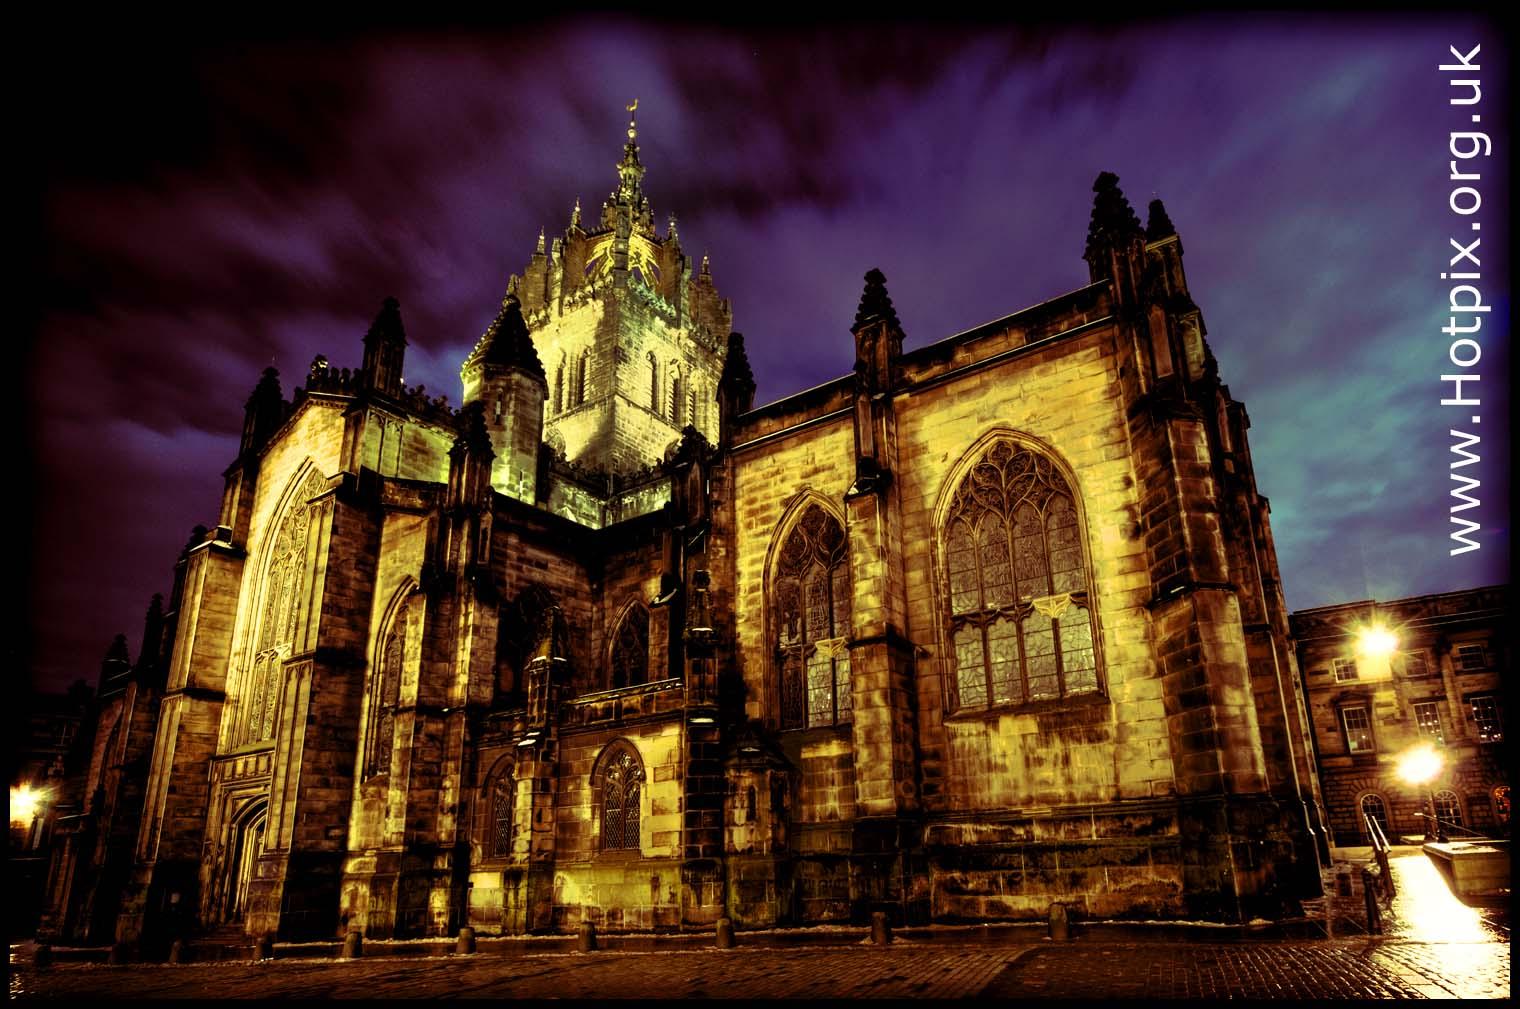 St Giles Cathedral,Edinburgh,Scotland UK tony smith hotpix tonysmith tonysmithhotpix UK GB things to see in edinburg dusk dawn blue magic hour night tripod shot  HDR,#tonysmith,#hotpix,#tonysmithhotpix,edimburgh